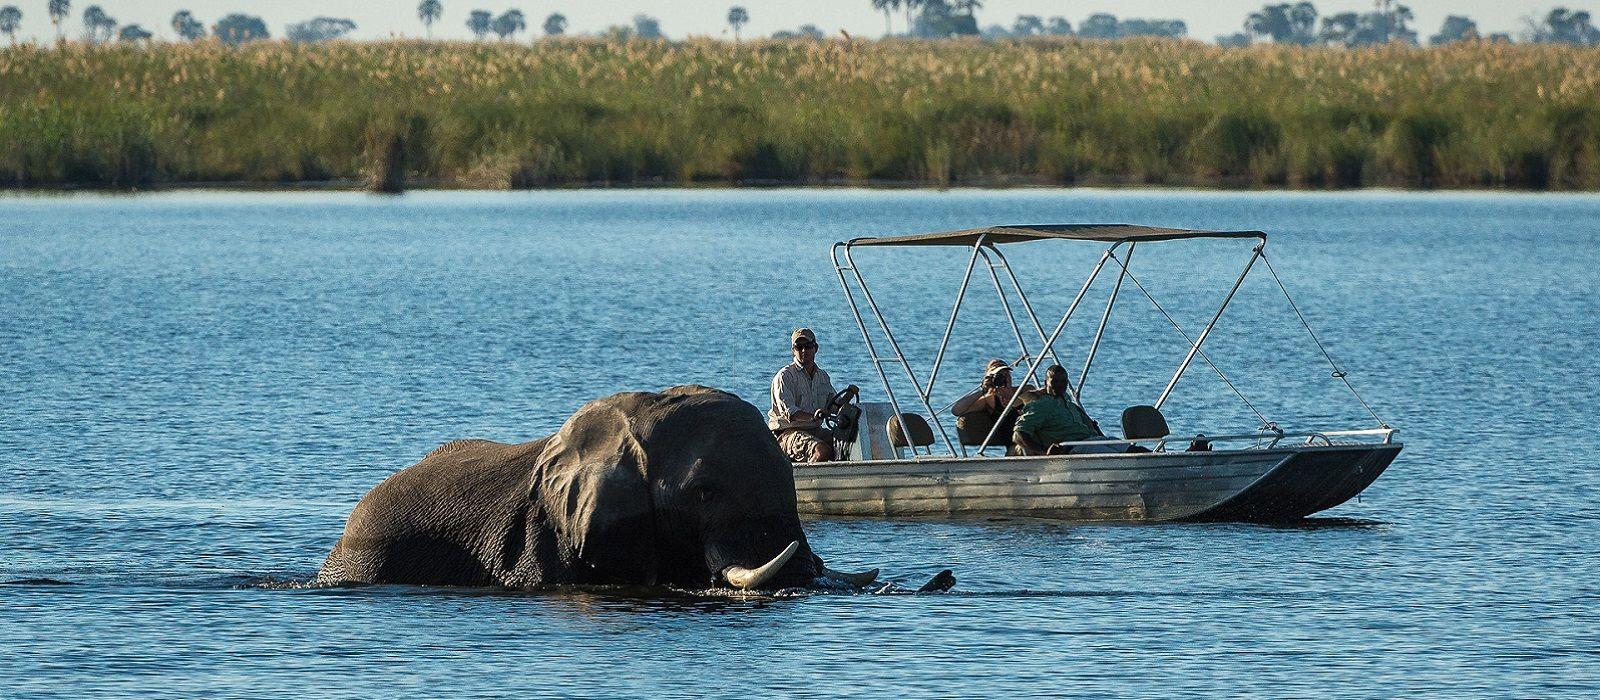 Safari Höhepunkte: Tansania, Simbabwe und Botswana Urlaub 7